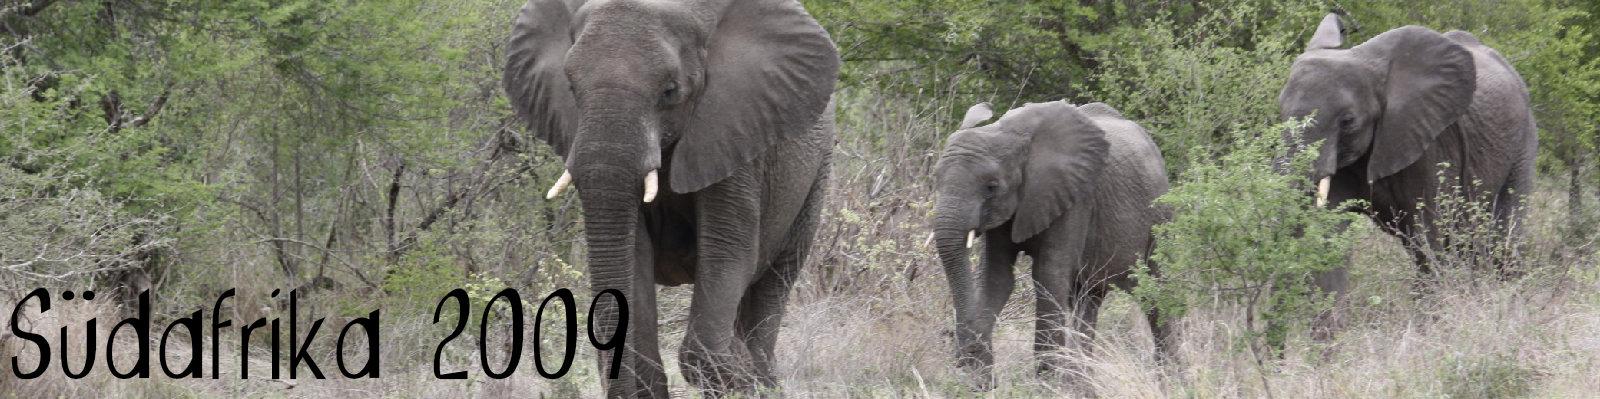 Südafrika 2009